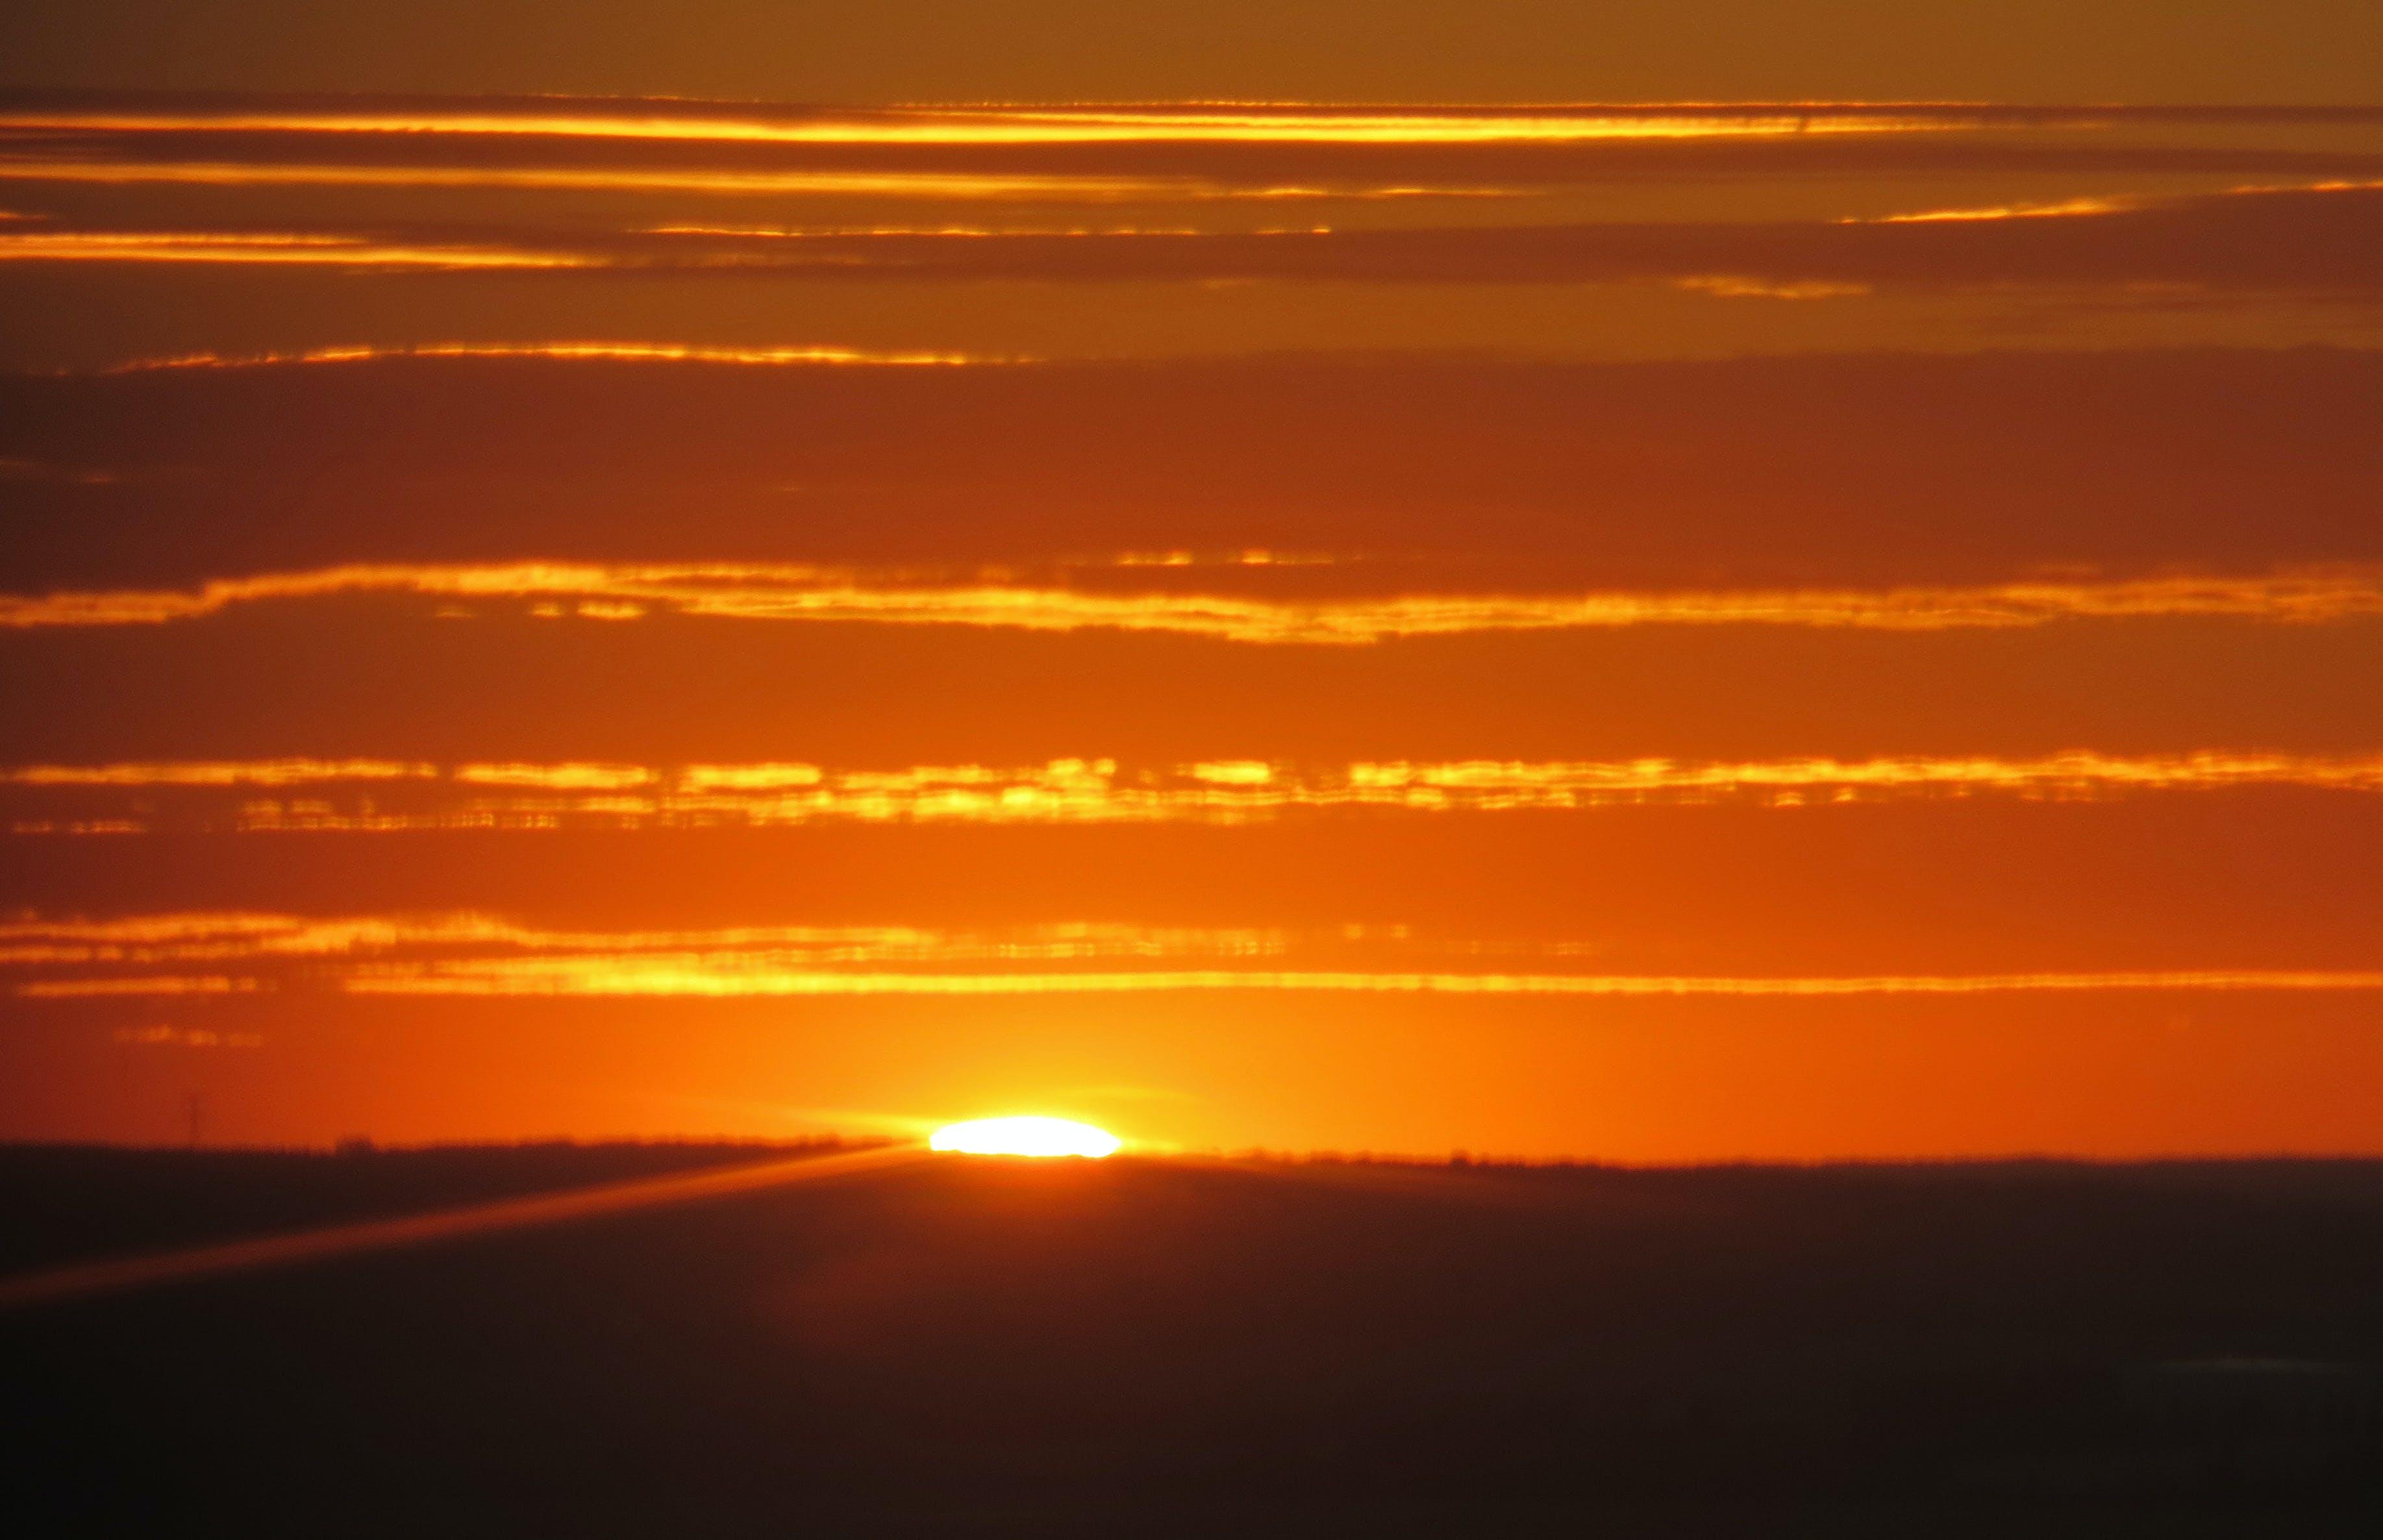 Free stock photo of sunset, clouds, sun, ground